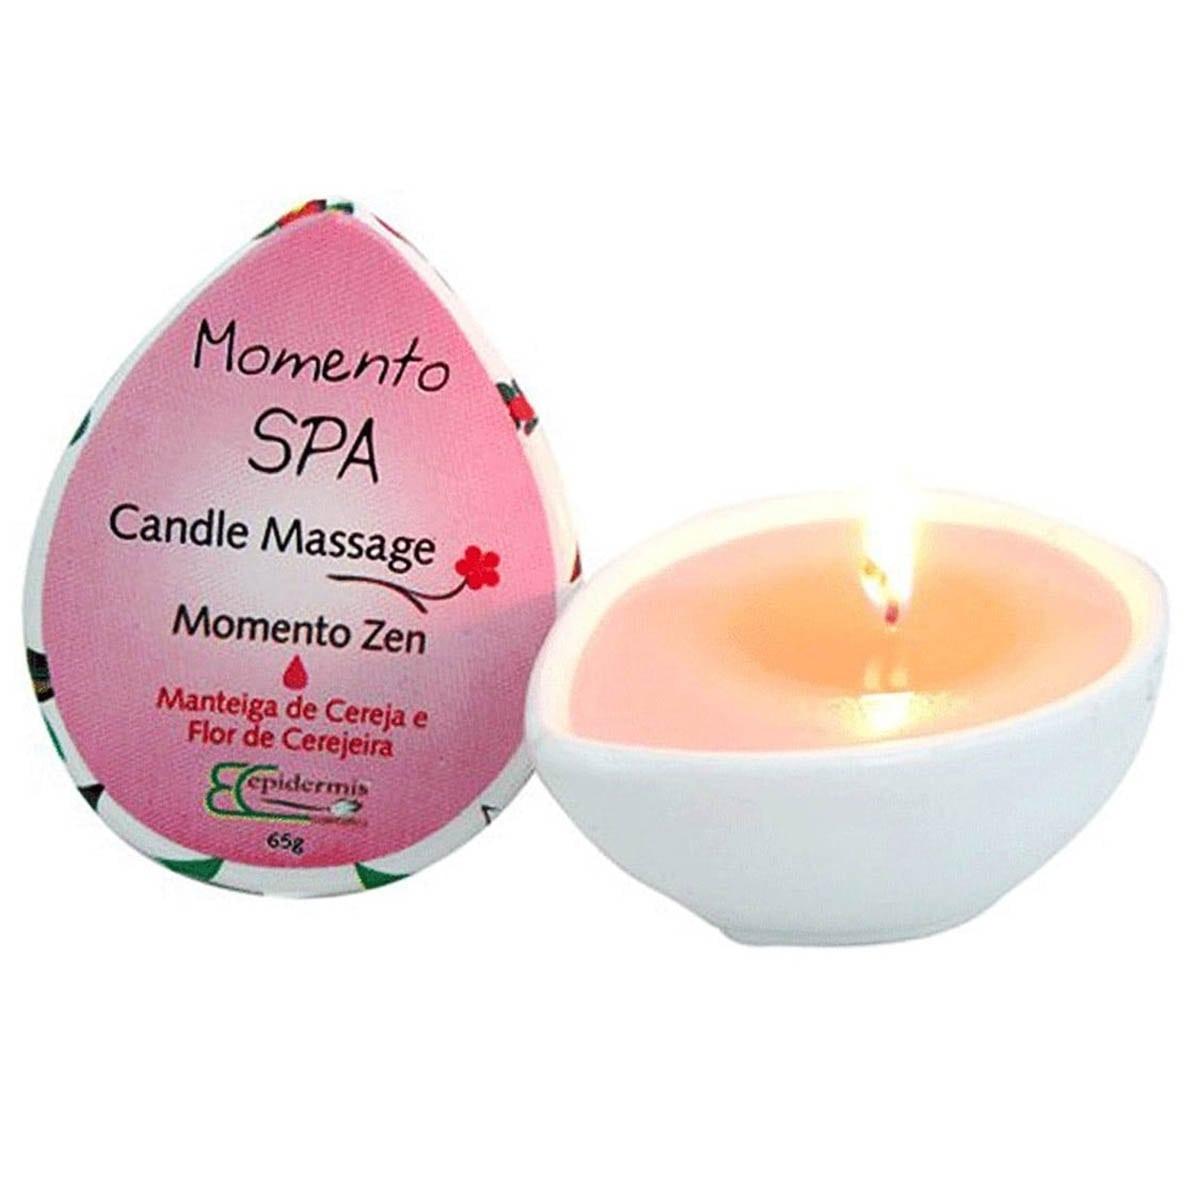 Candle massage momento zen 65g - epidermis